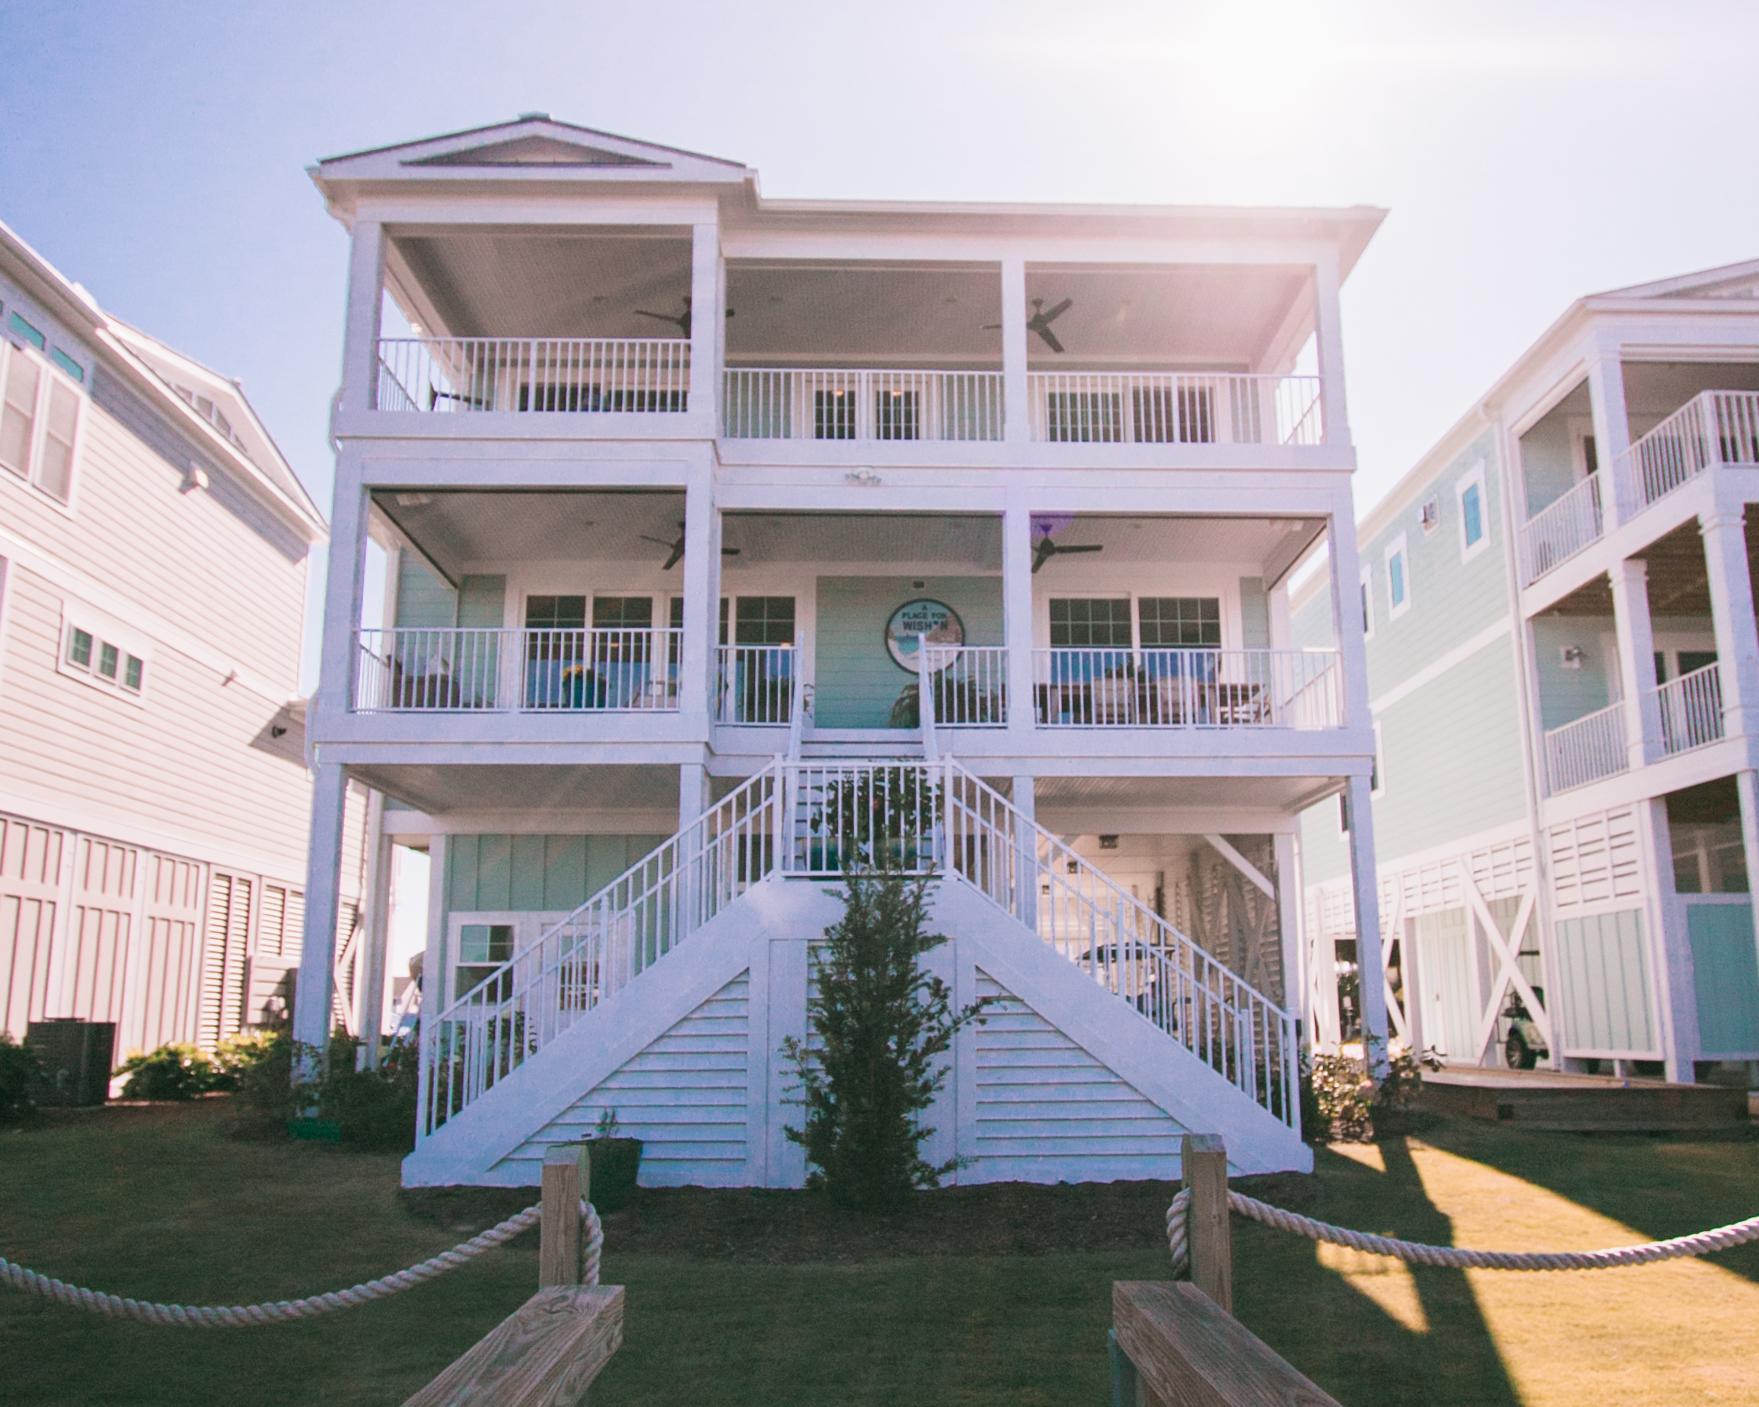 Sunset beach NC luxury beach home exterior